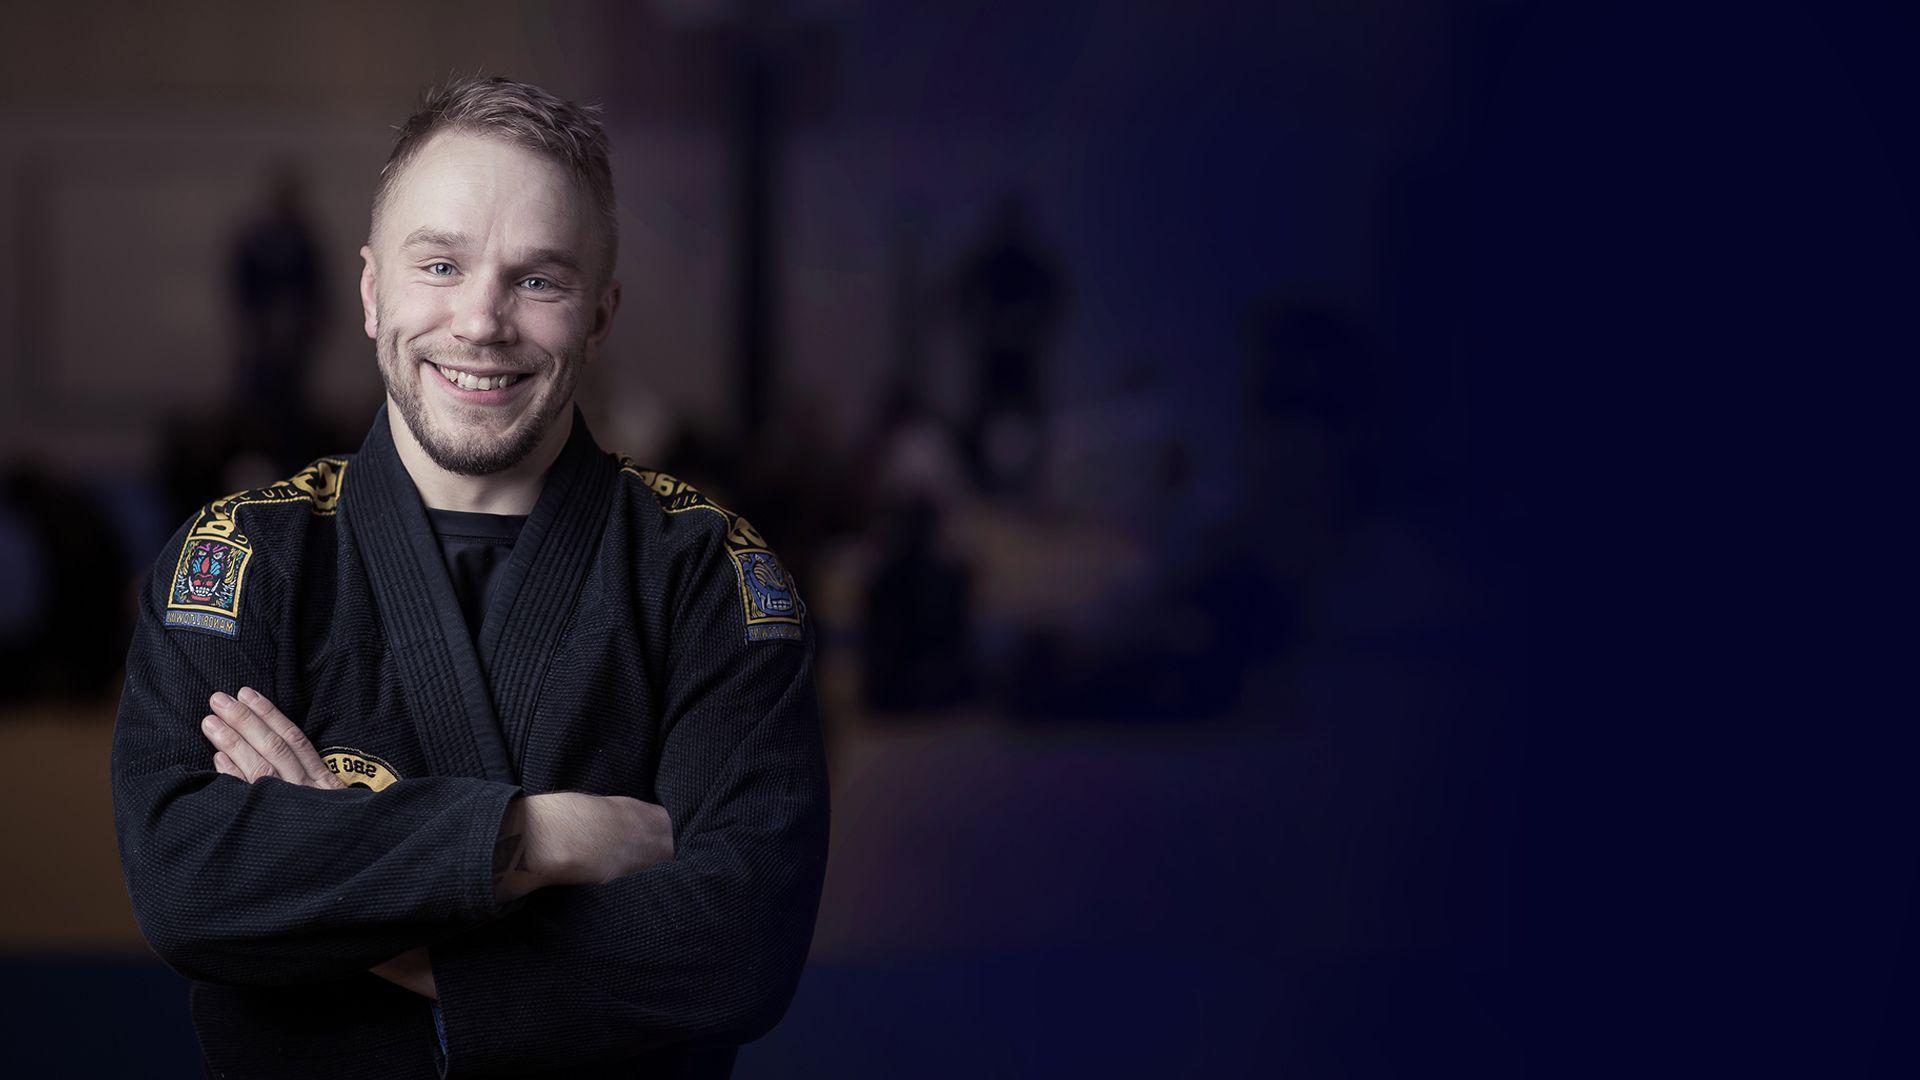 Jorgen Matsi